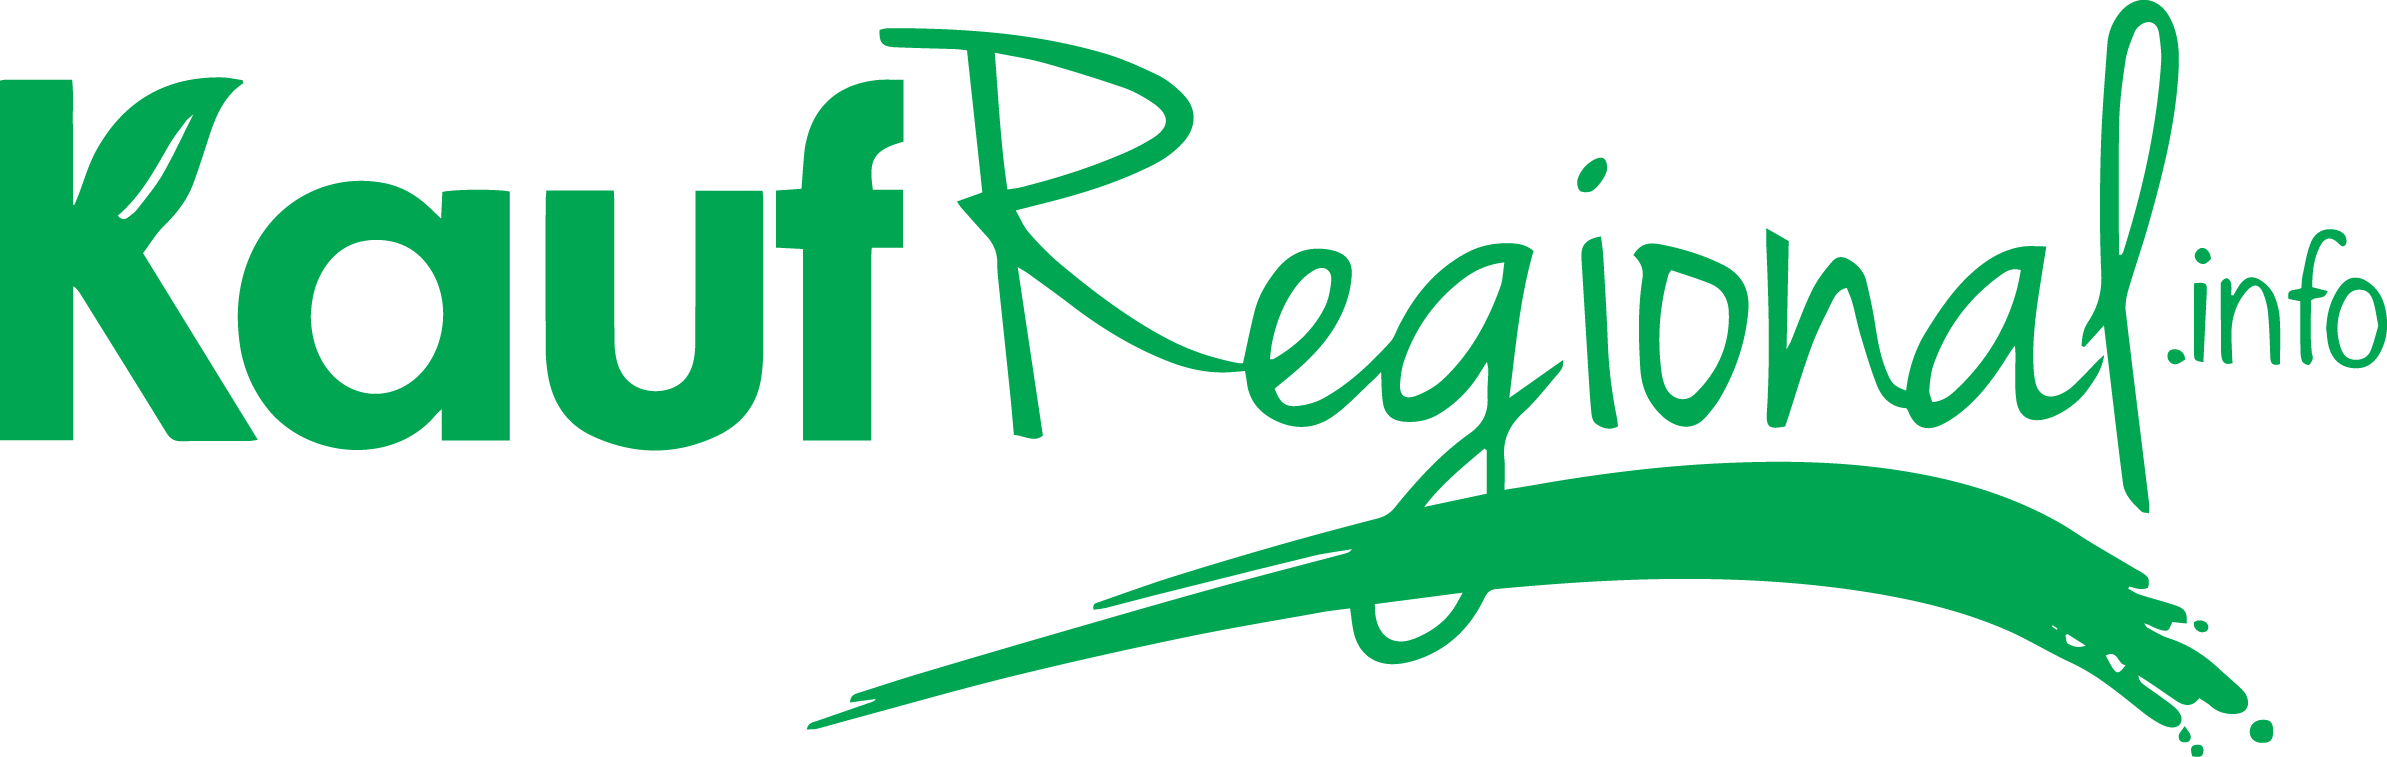 jpg freeuse stock Konzept der Initiative Kauf Regional